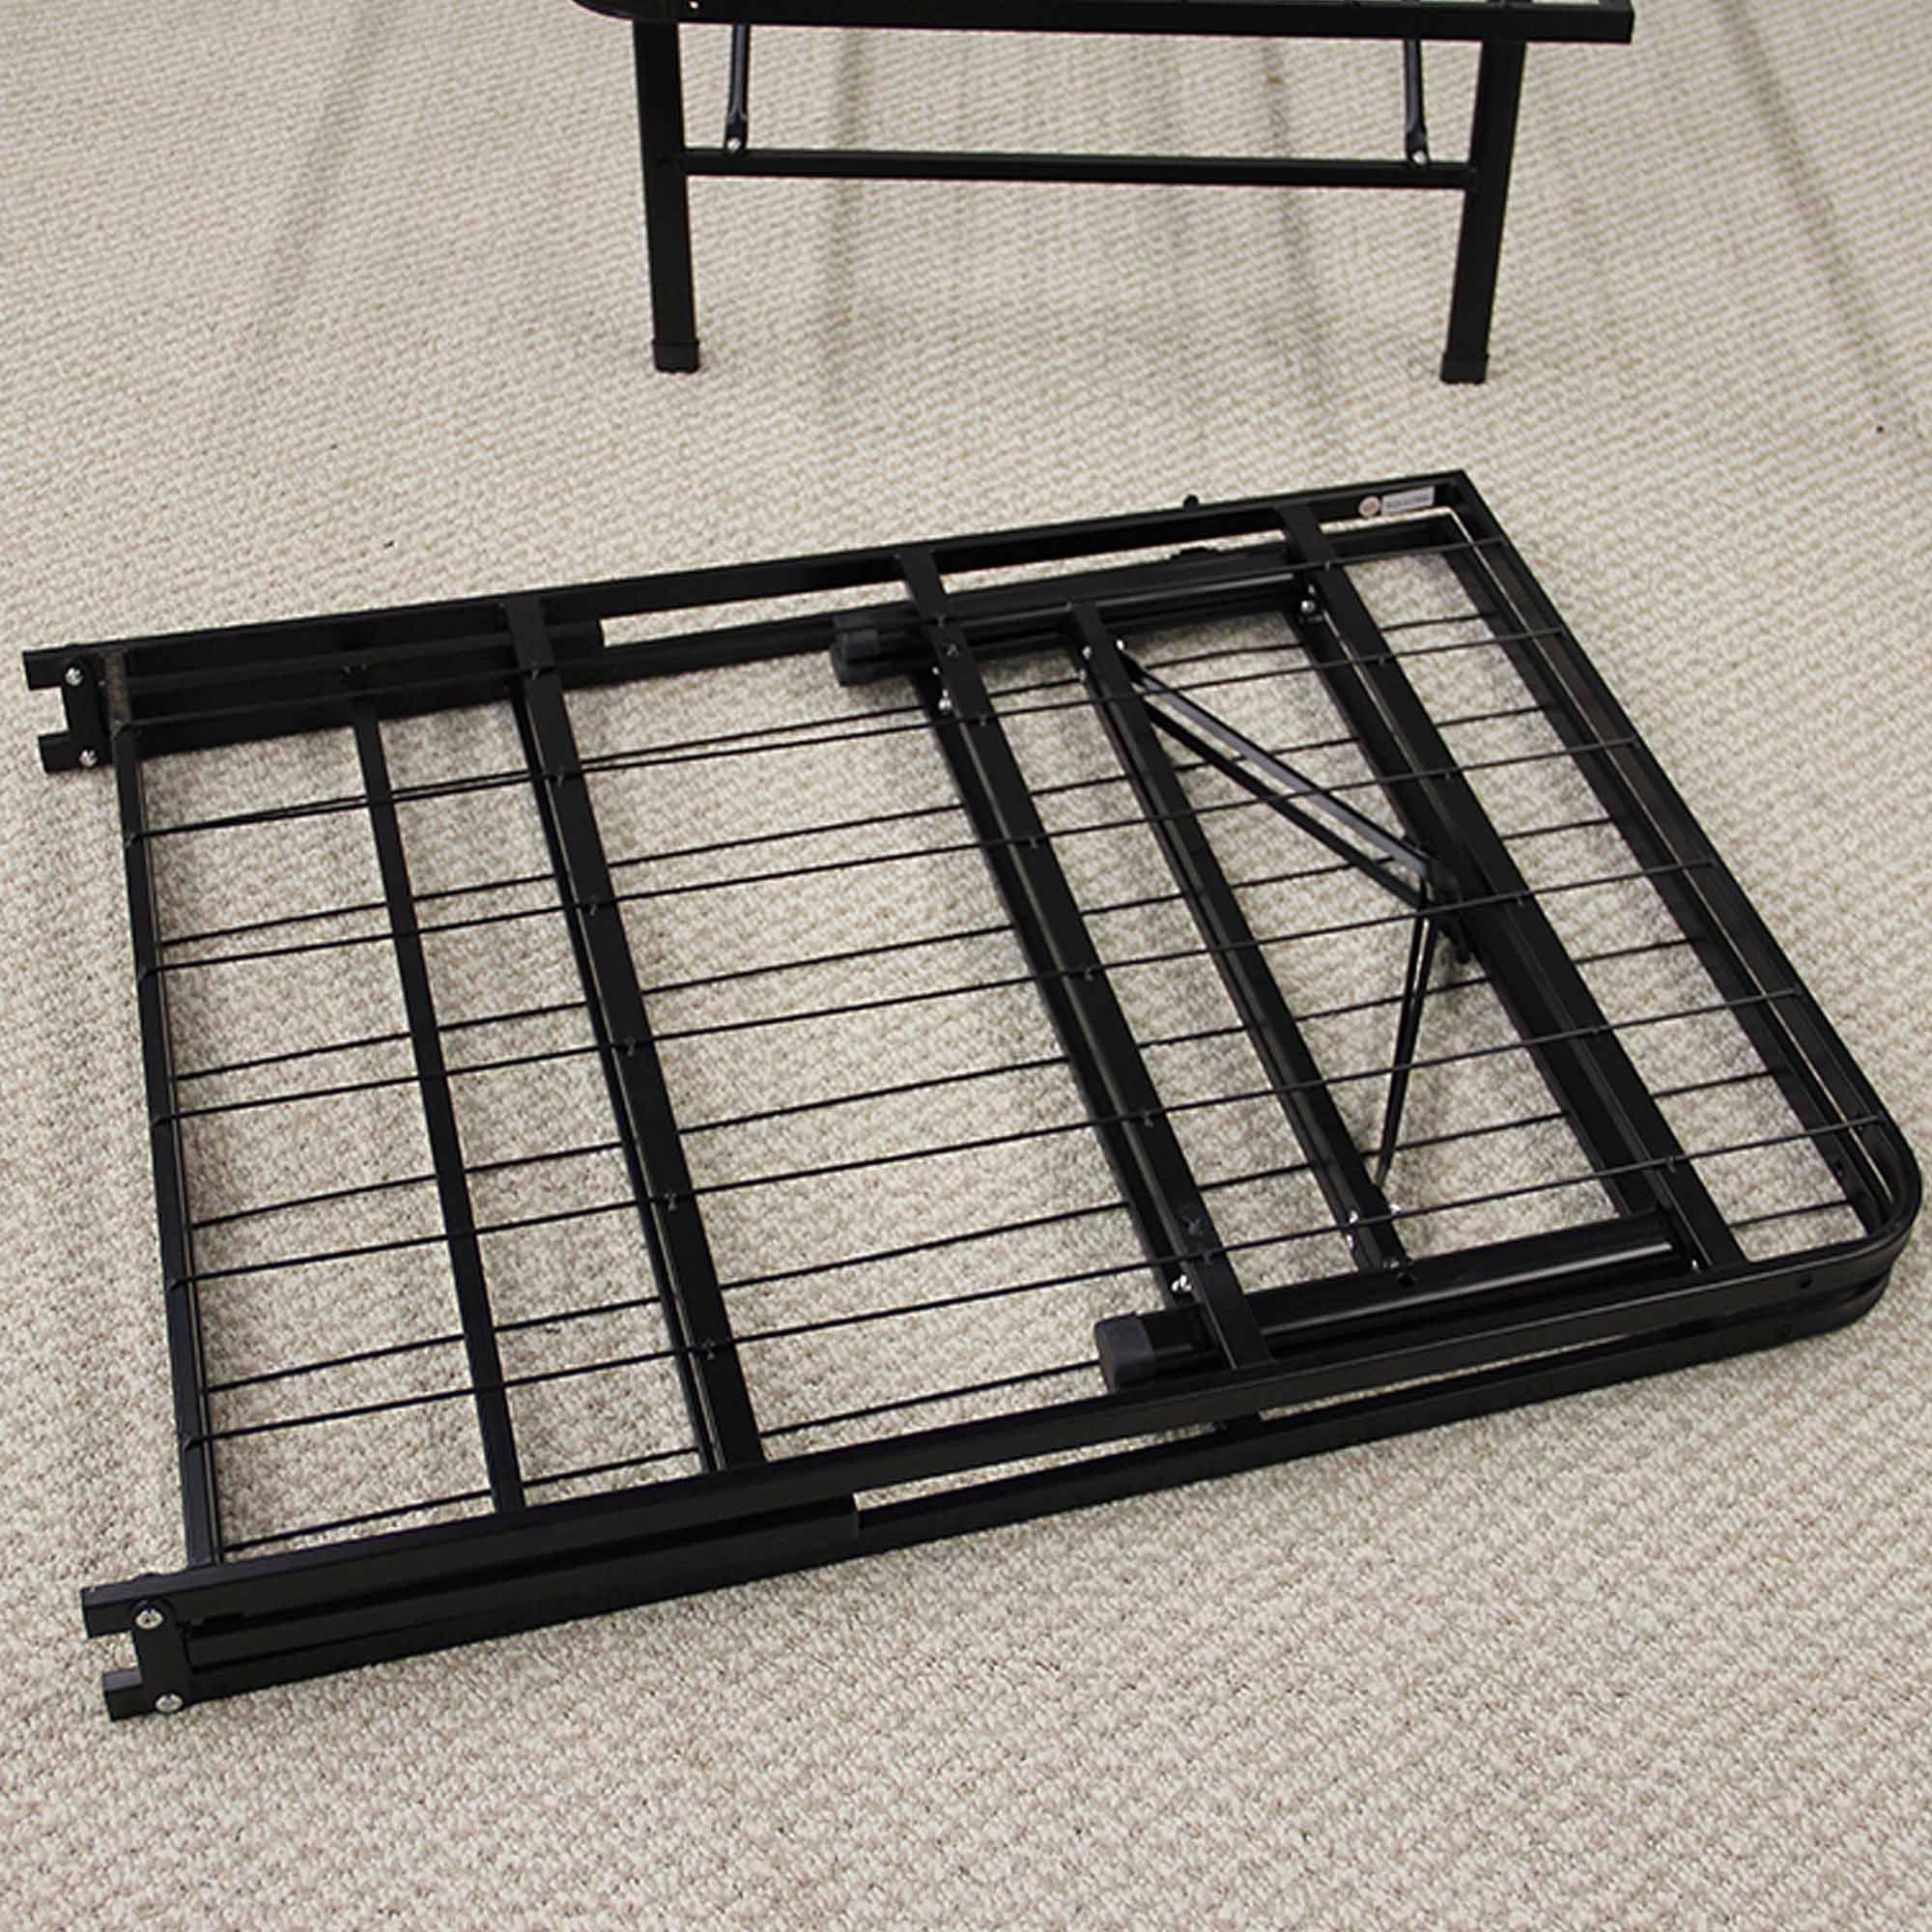 modern sleep platform metal bed frame mattress foundation walmartcom - Metal Bed Frames Full